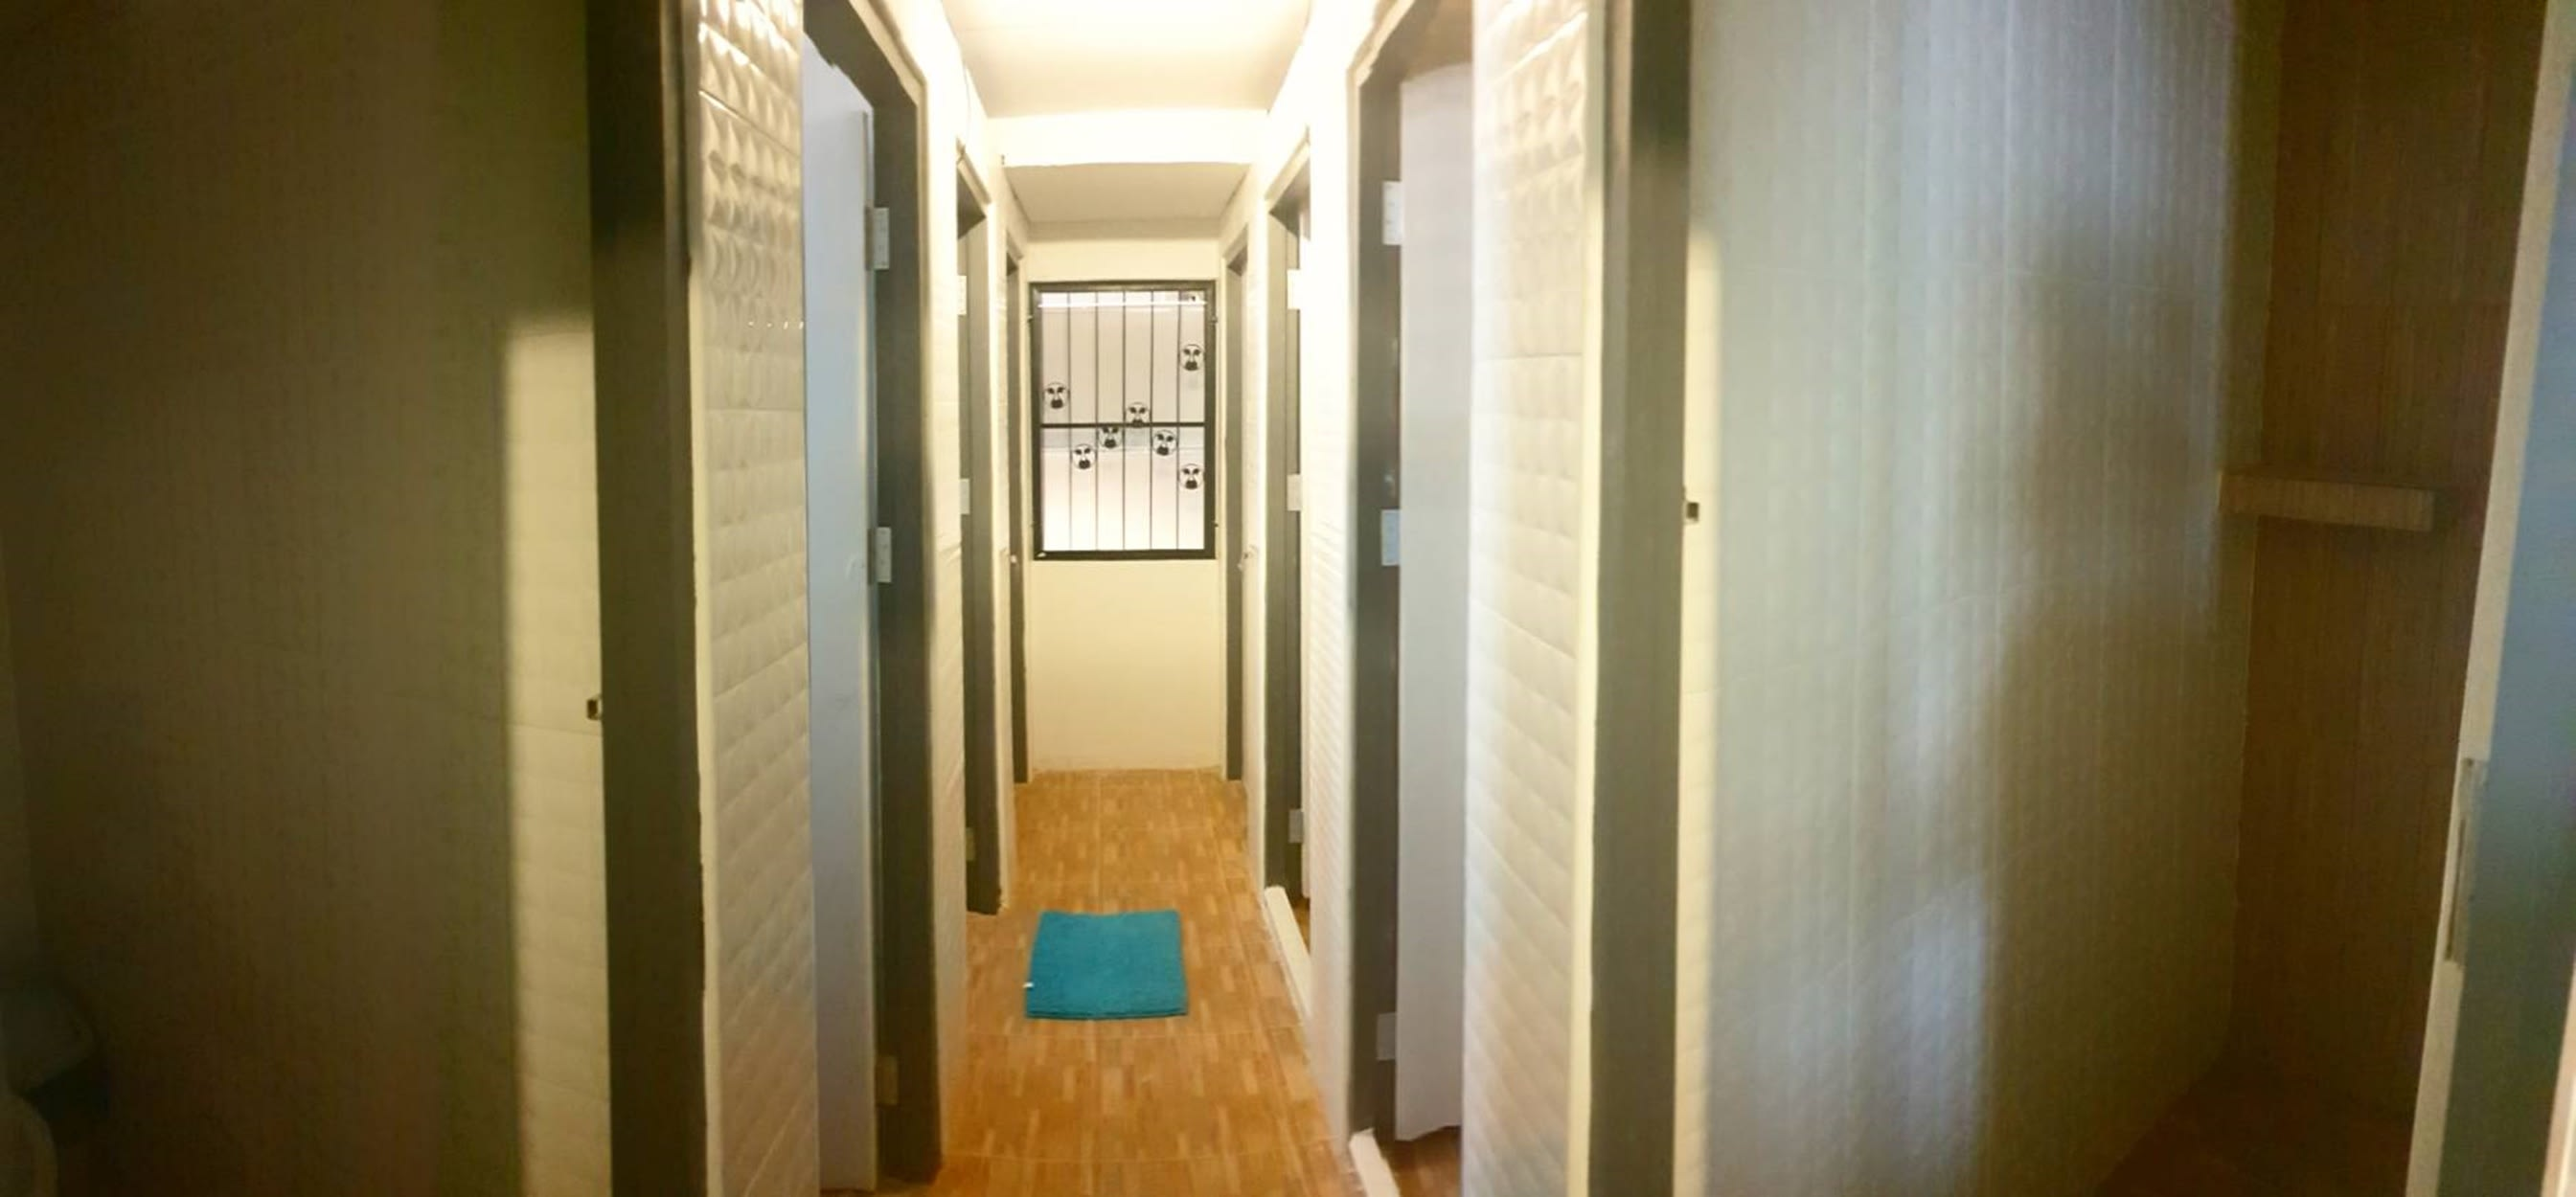 HOSTEL - Me U3 Hostel